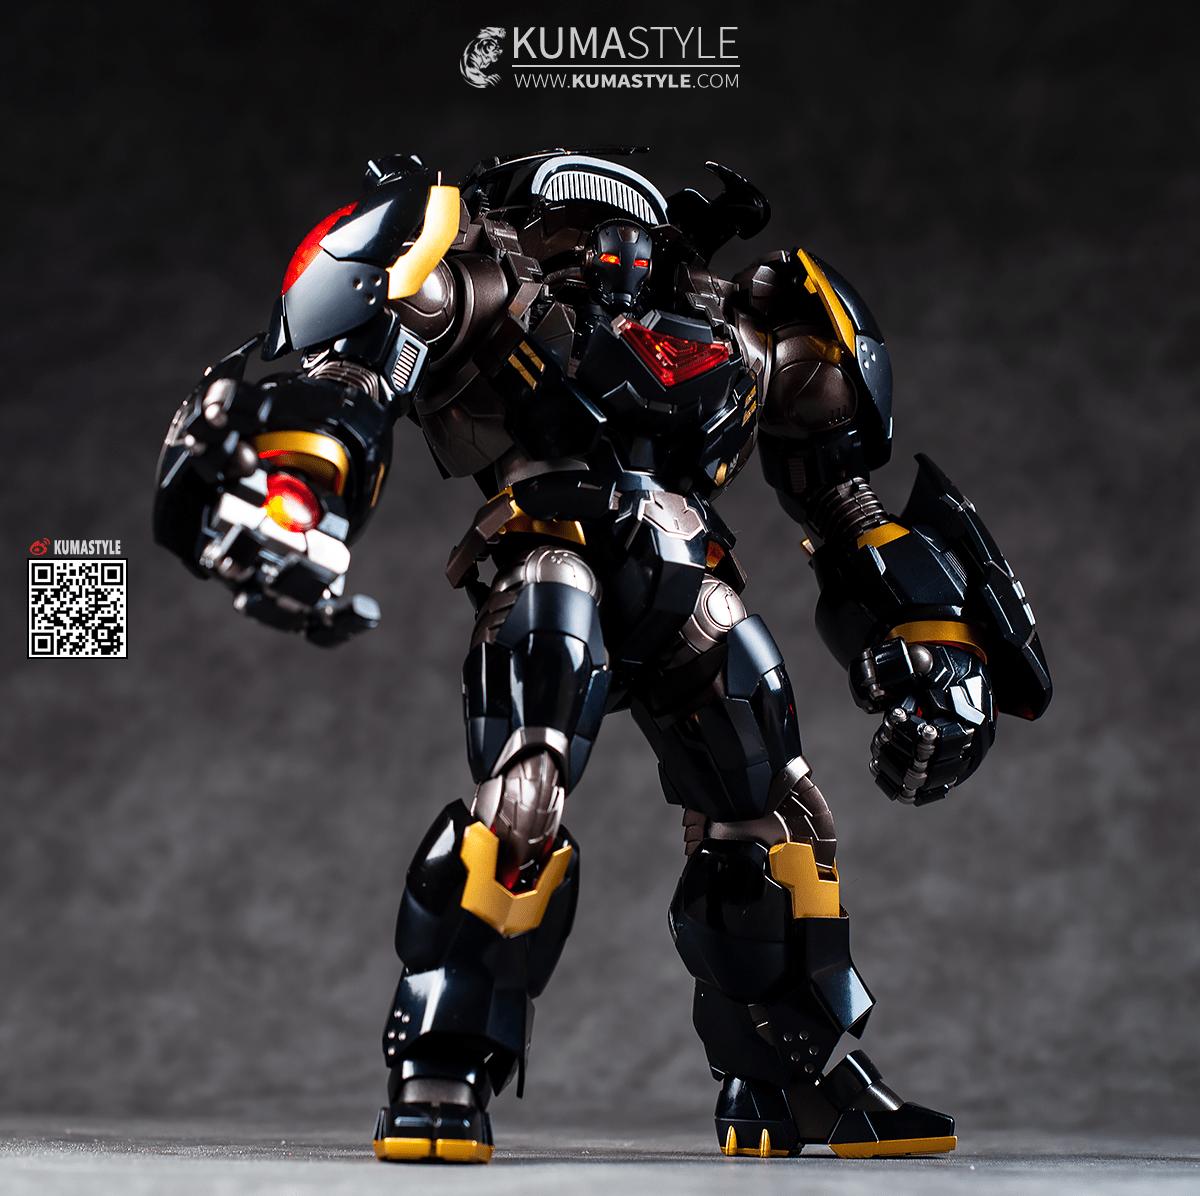 Hulk Buster Heavy Duty Modular Armor (Mattel) OC1iJe9e_o